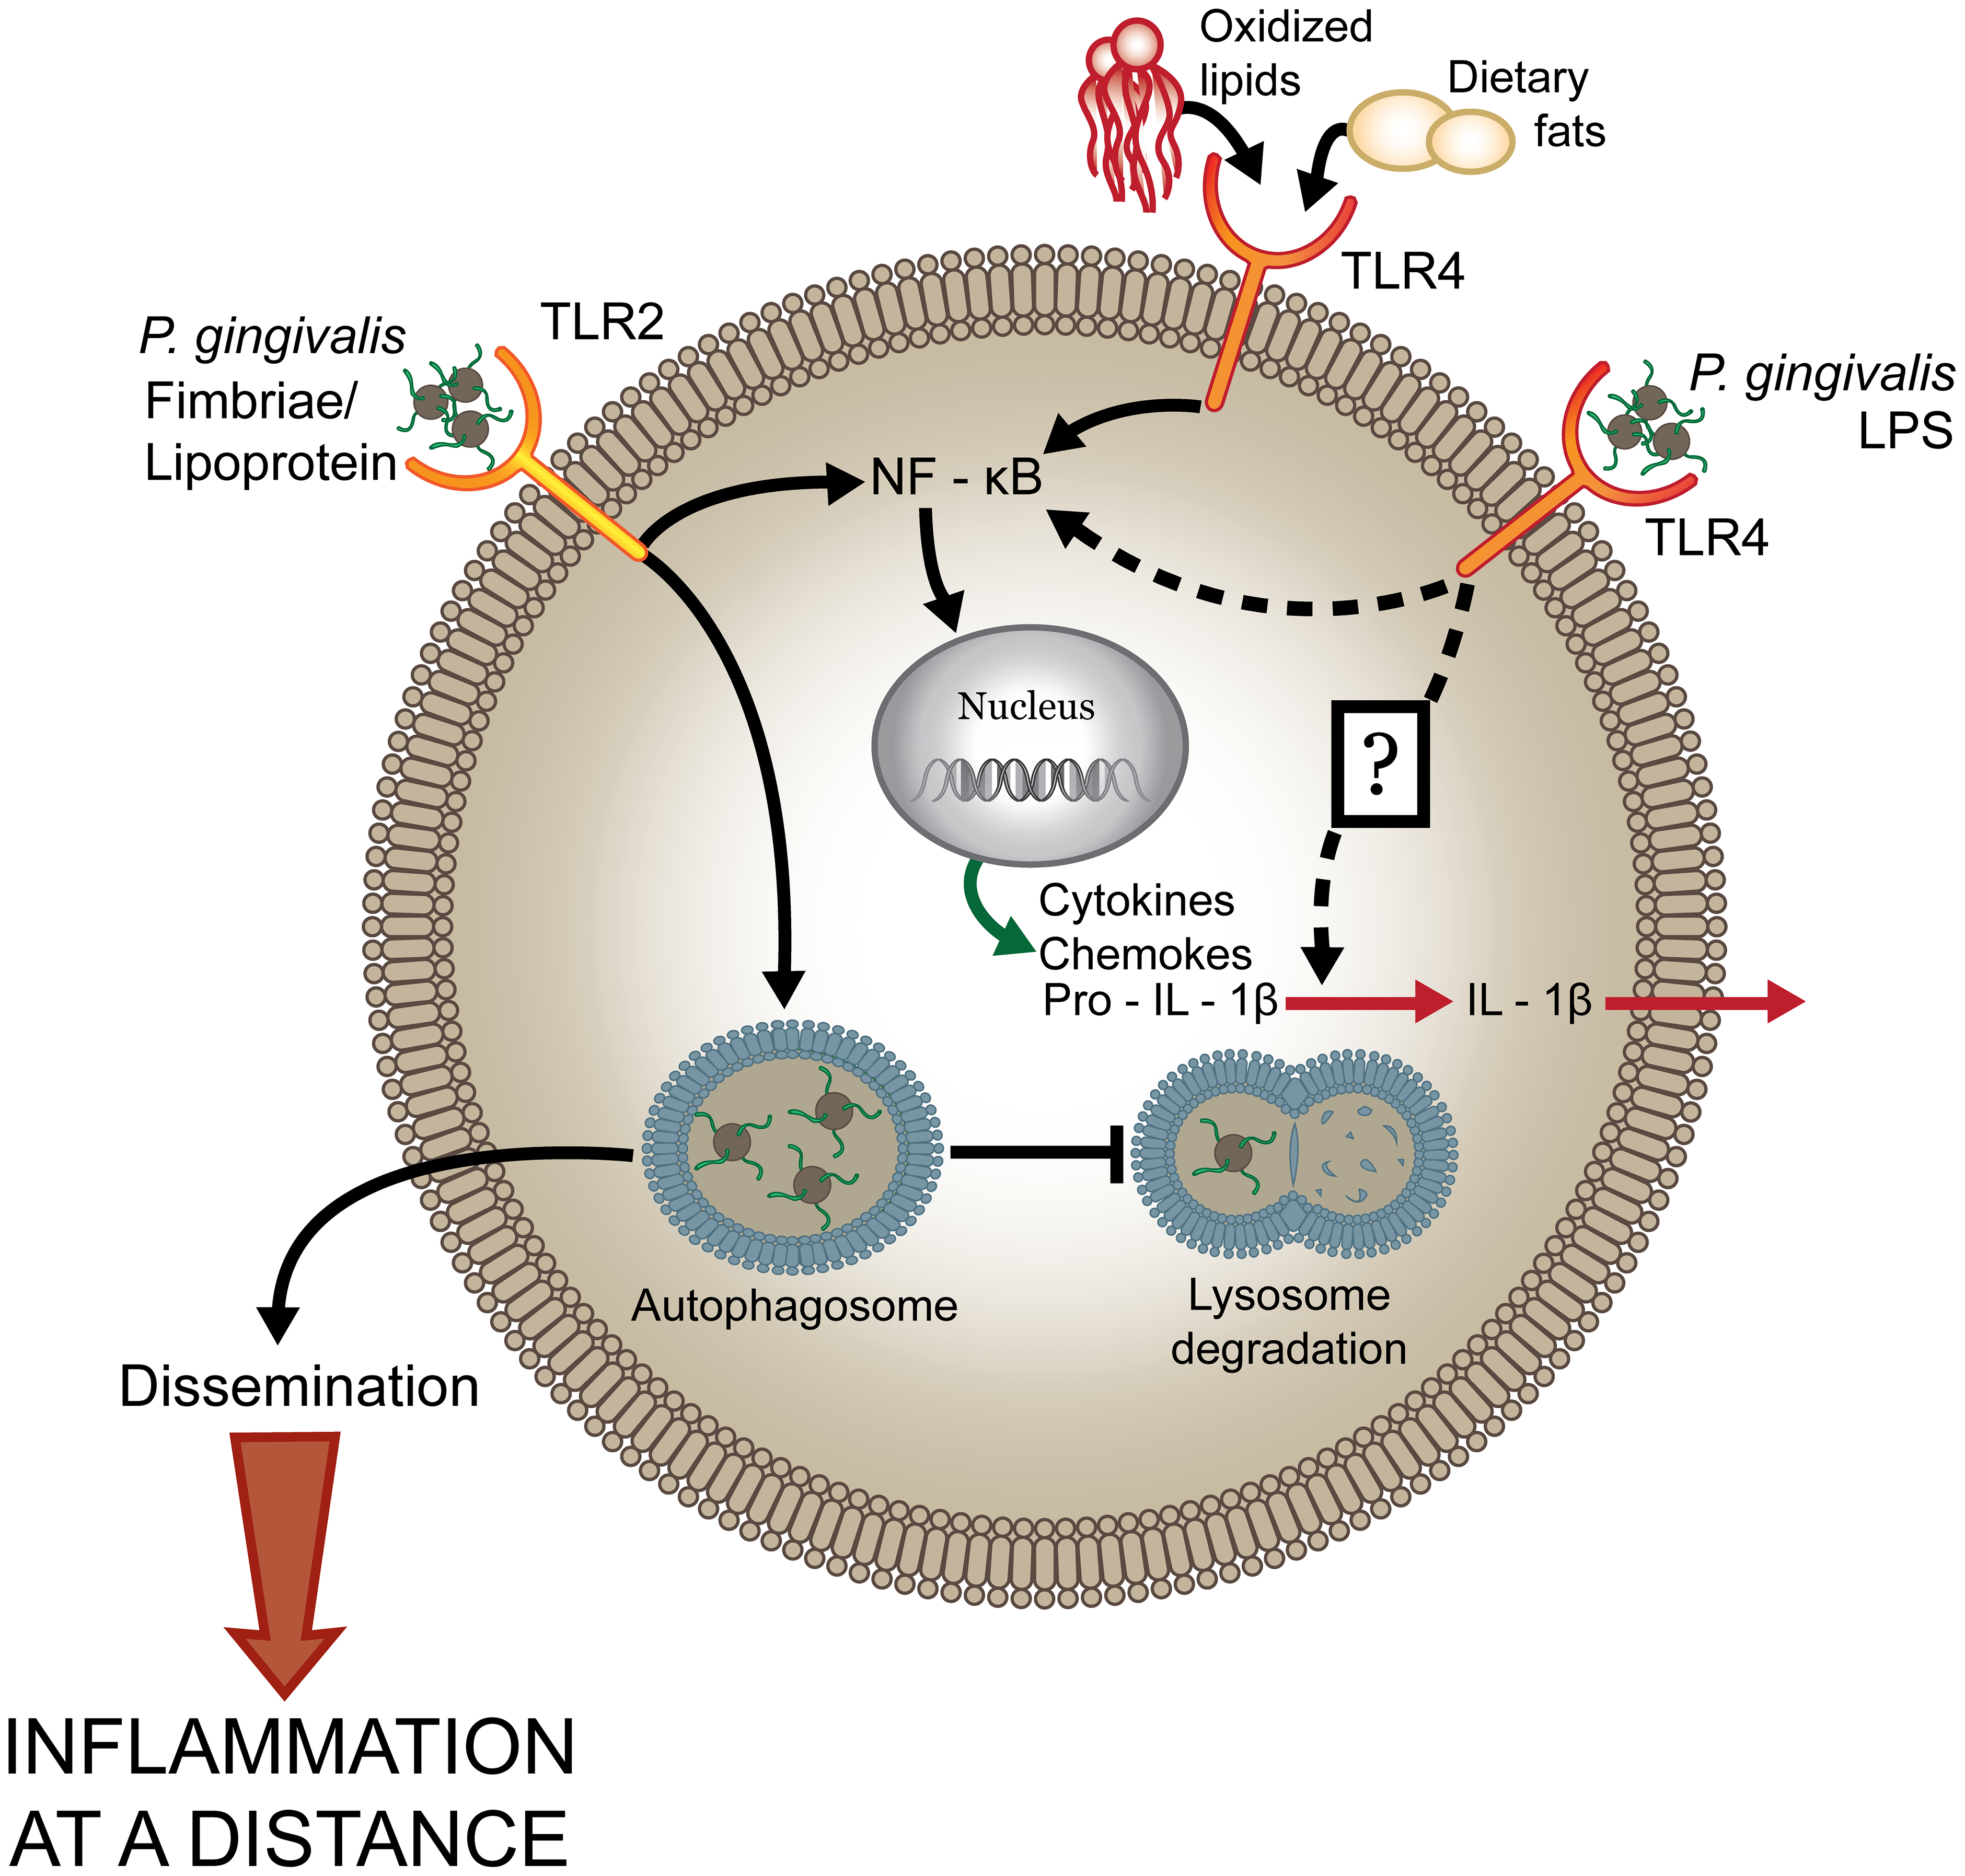 <i>P. gingivalis</i> dysregulates host cell immune activation facilitating systemic inflammation.